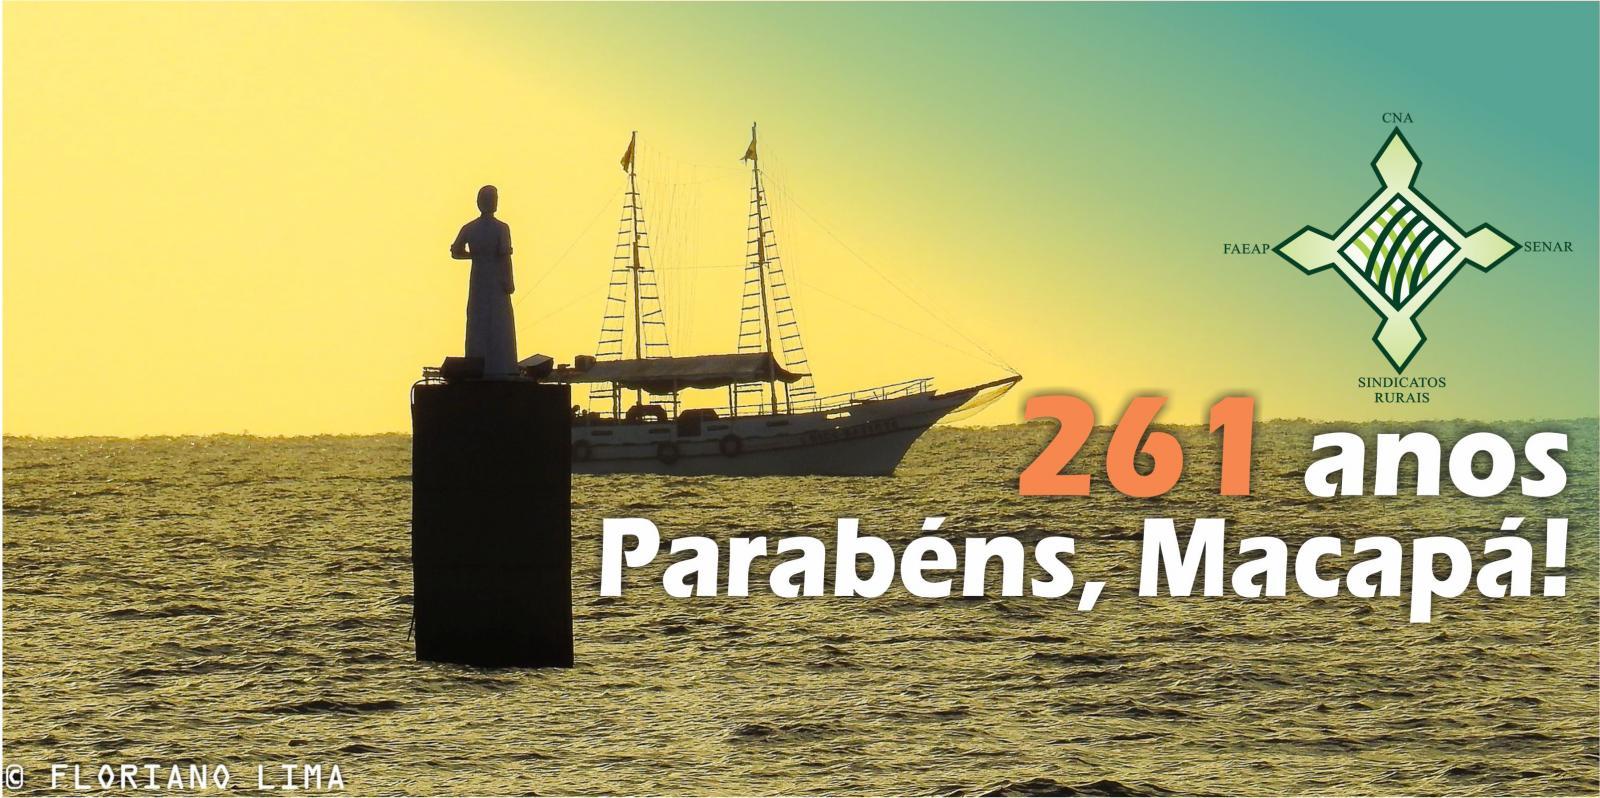 O Sistema Faeap/Senar-AP/Sindicatos Rurais parabeniza Macapá pelos 261 anos